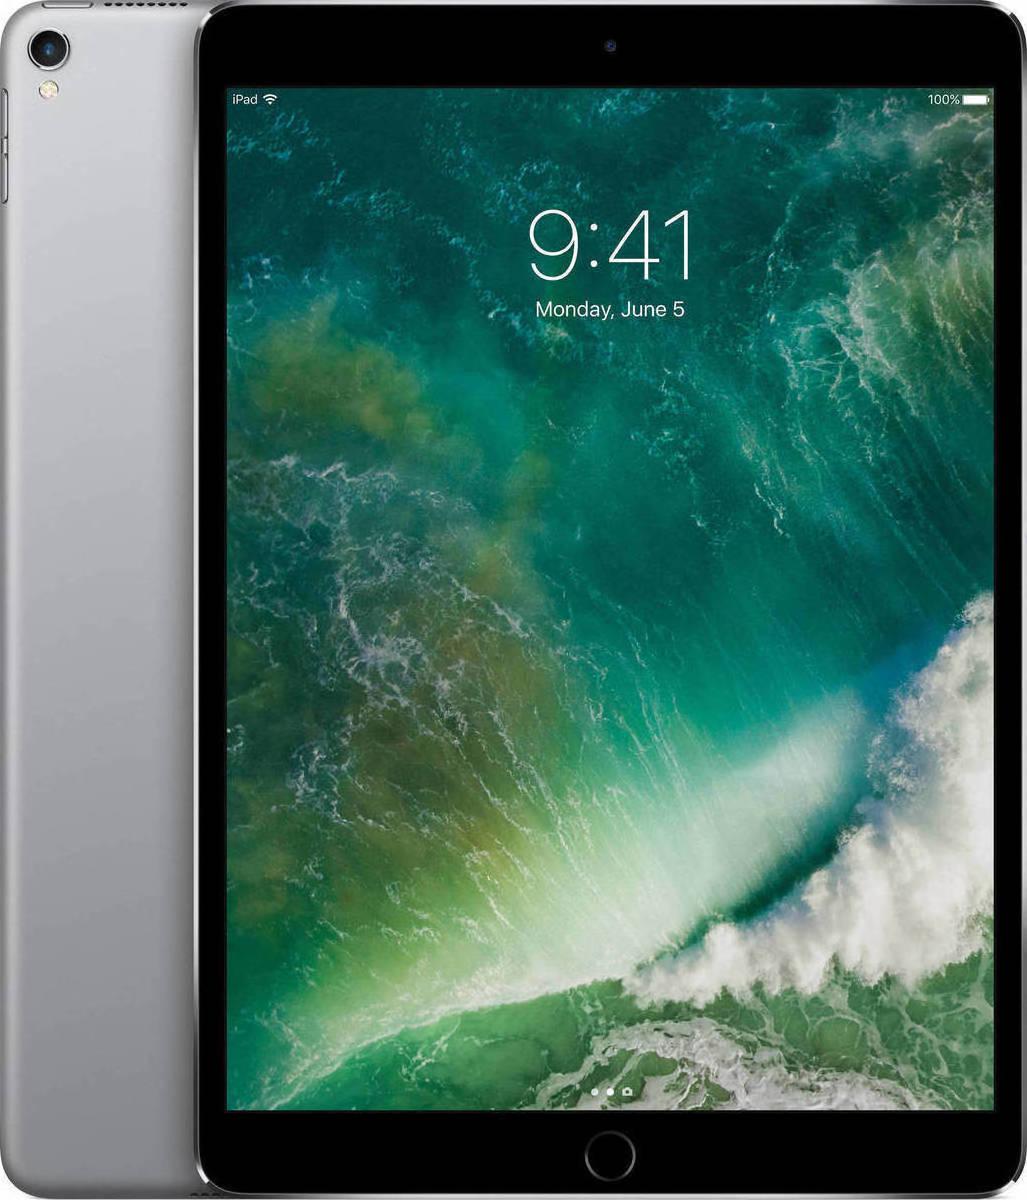 Apple iPad Pro 12.9'' 2017 WiFi and Cellular 512GB Space Grey Με Αντάπτορα Πληρωμή έως 12 δόσεις